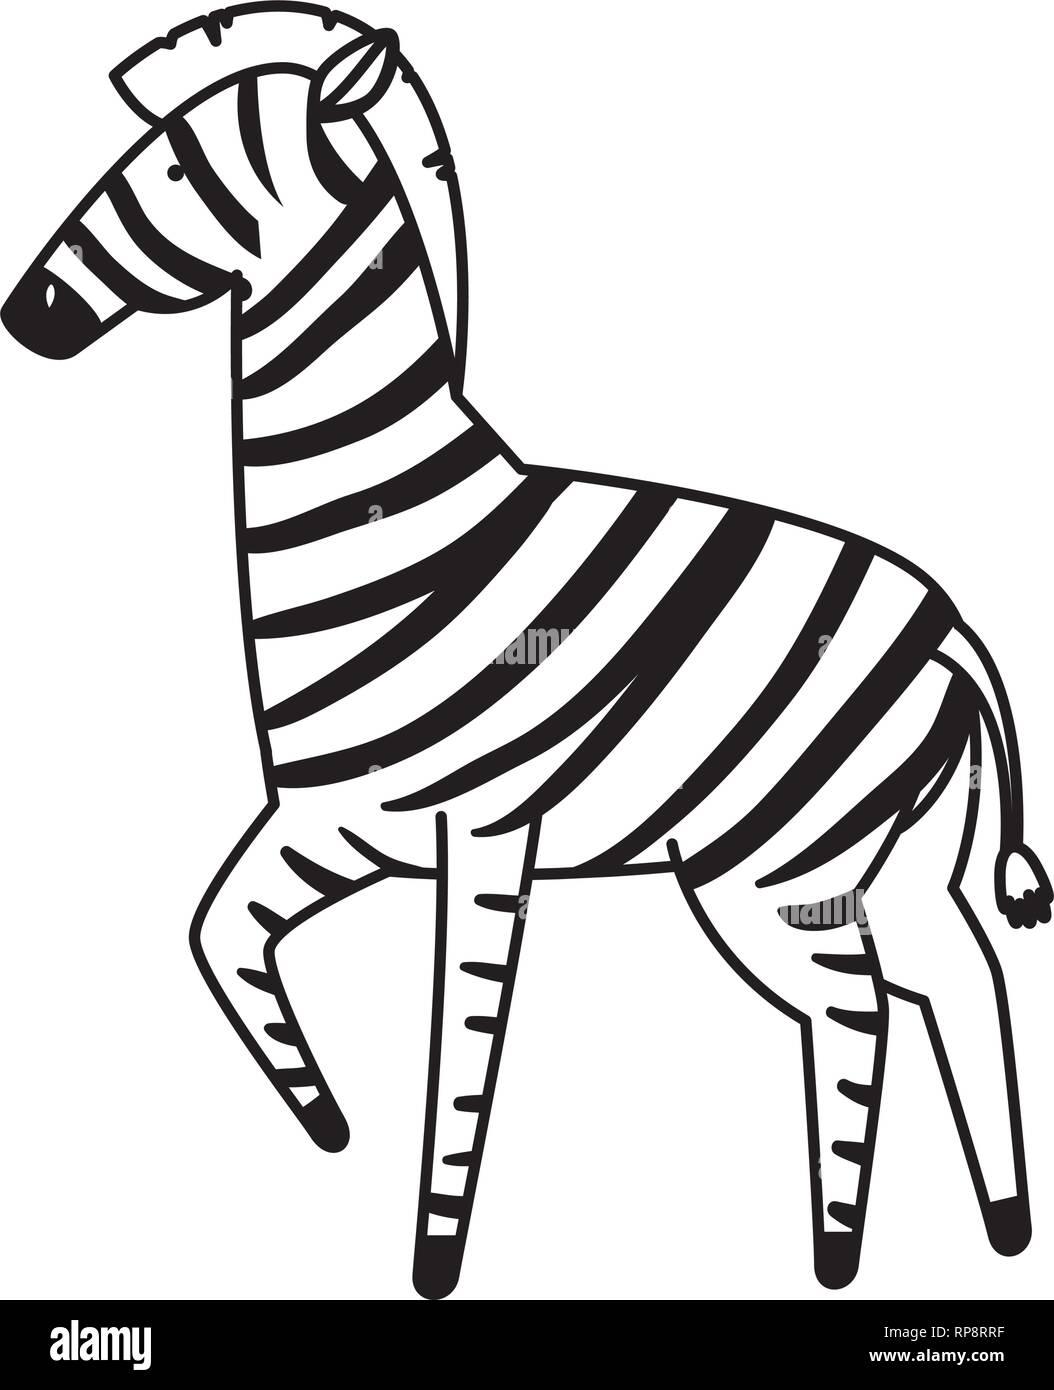 3afdda4ea411f african zebra wild character vector illustration design - Stock Image